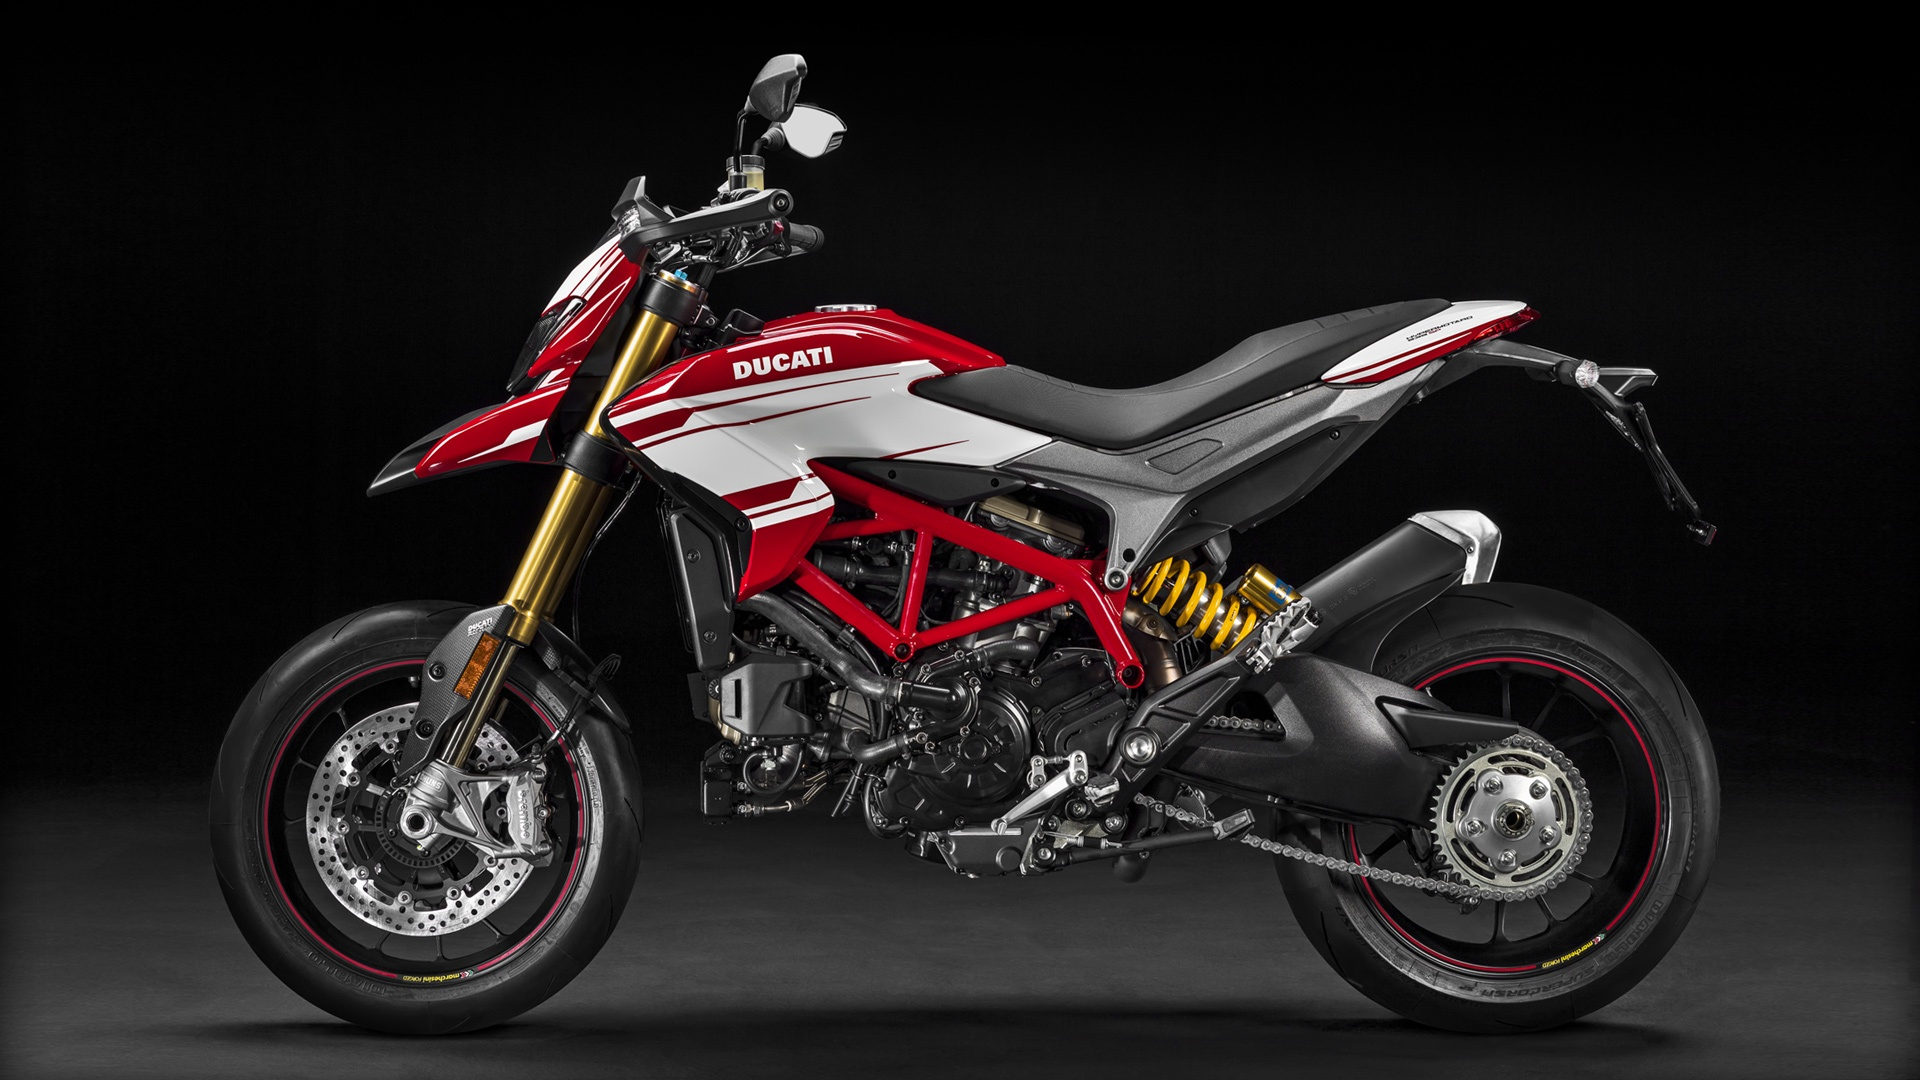 Ducati Hypermotard 939 Sp For Sale Uk Ducati Manchester